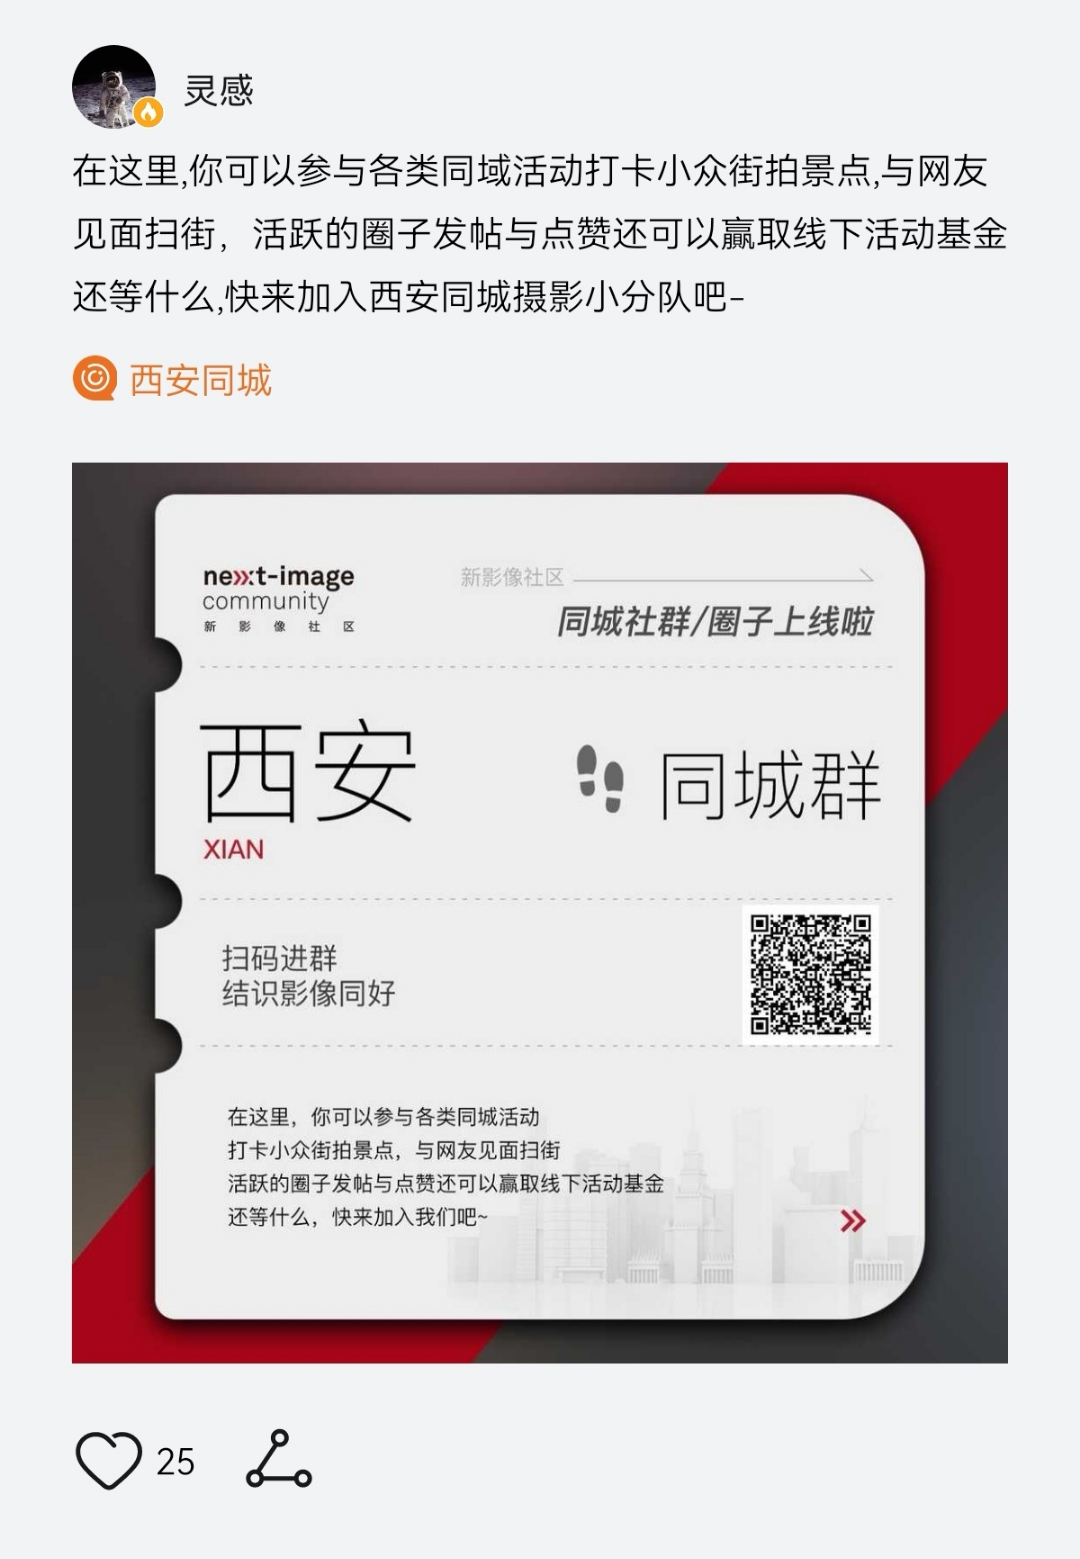 Screenshot_20210714_101829_com.huawei.android.thememanager_edit_43367861272028.jpg